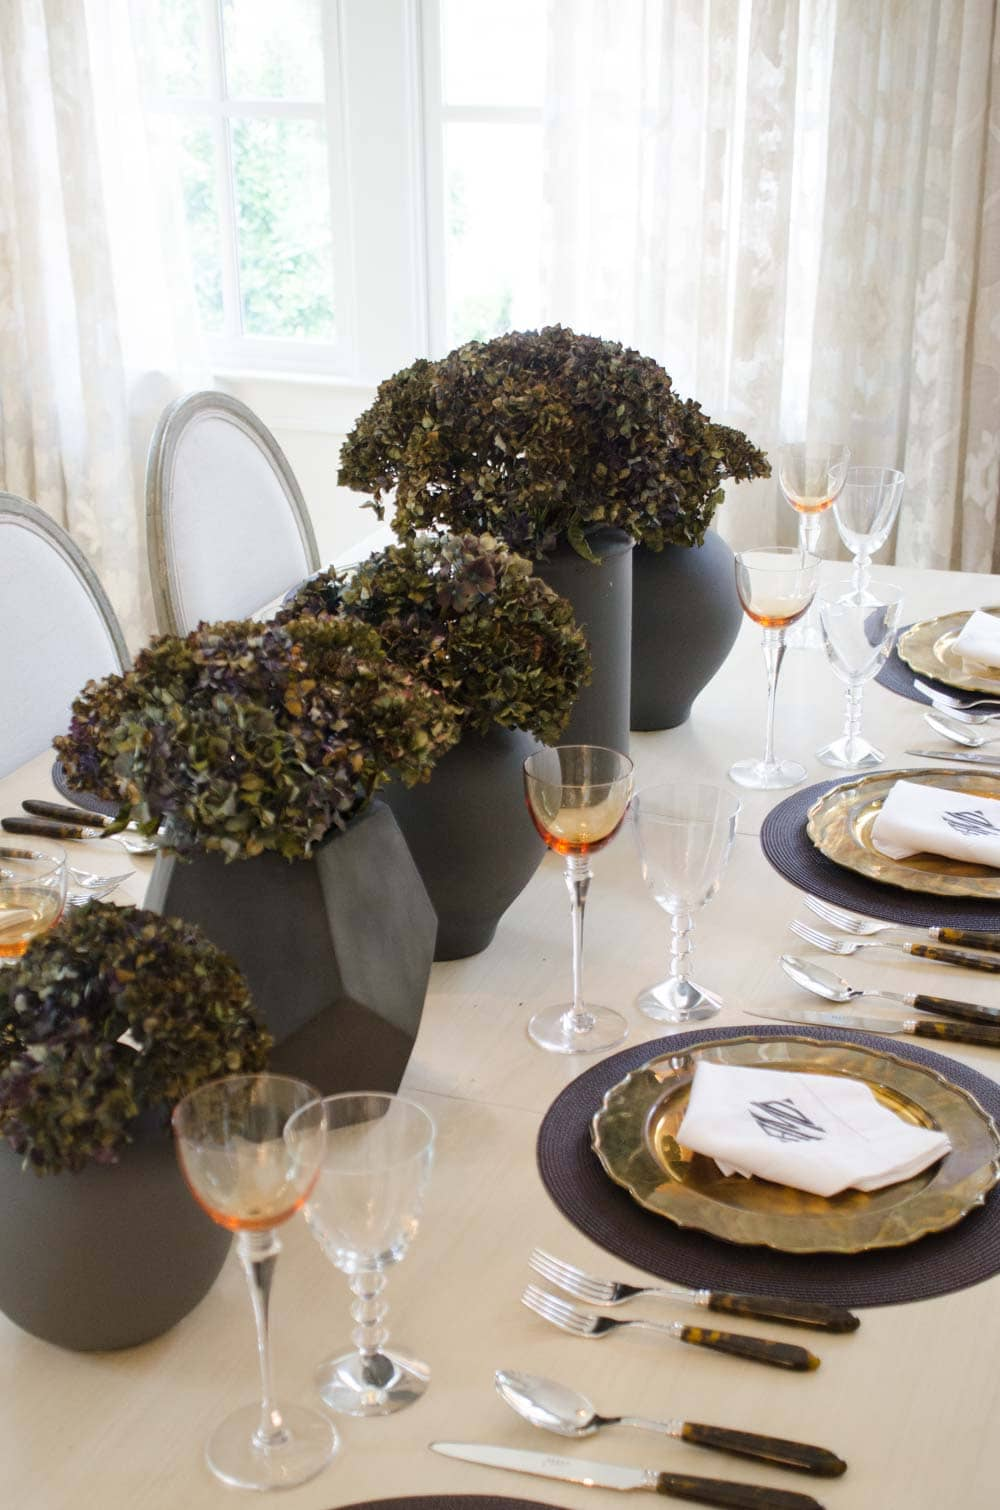 Black hydrangeas line a pale dining room table